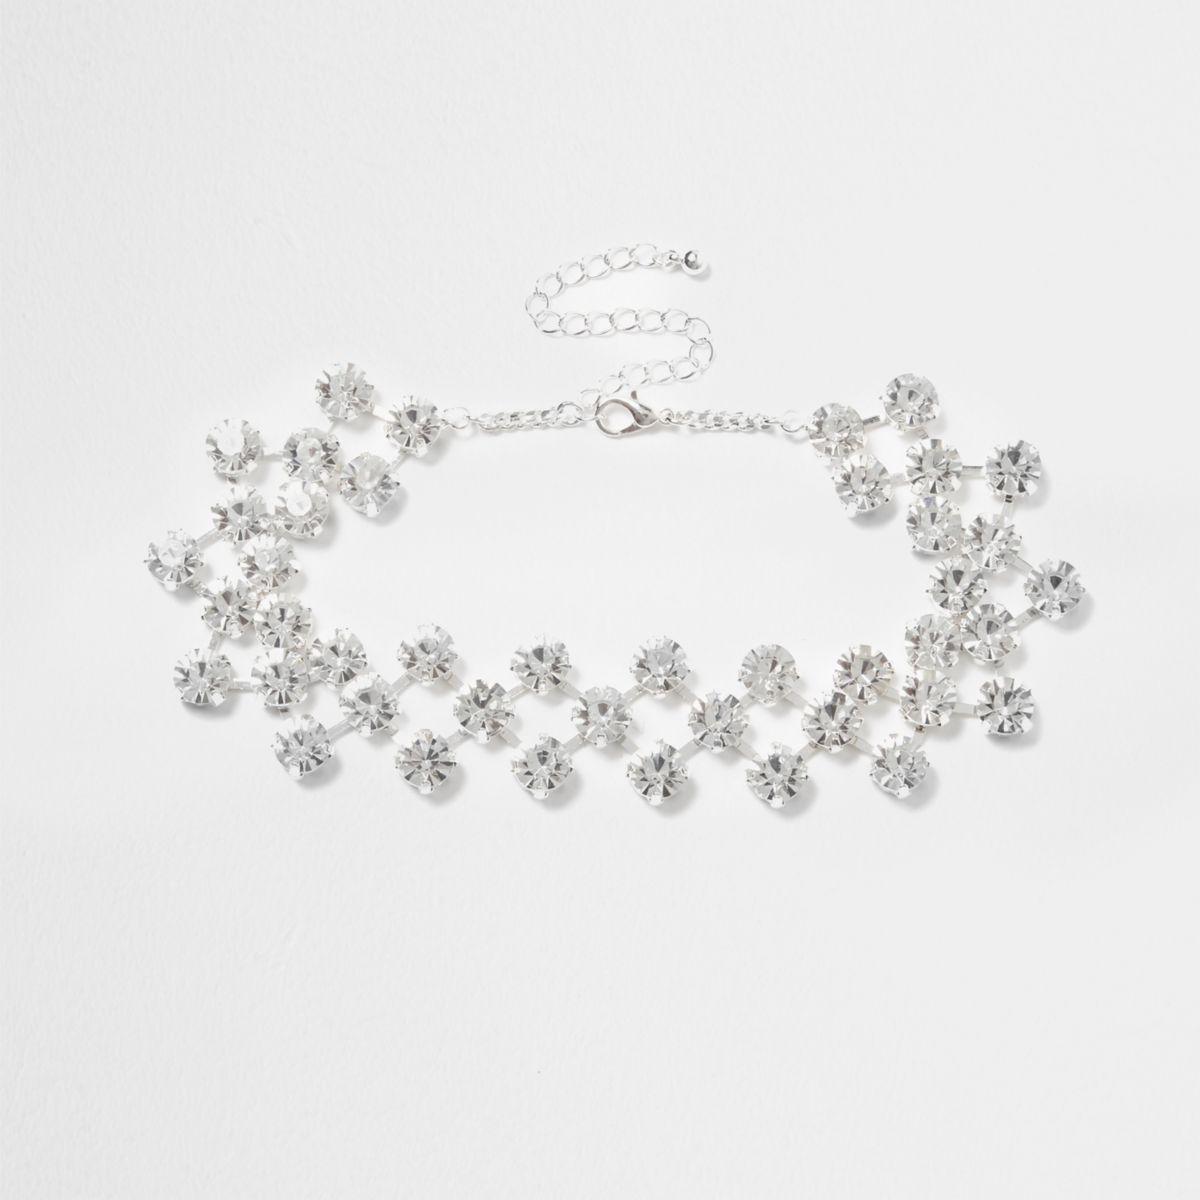 Silver tone diamante encrusted choker